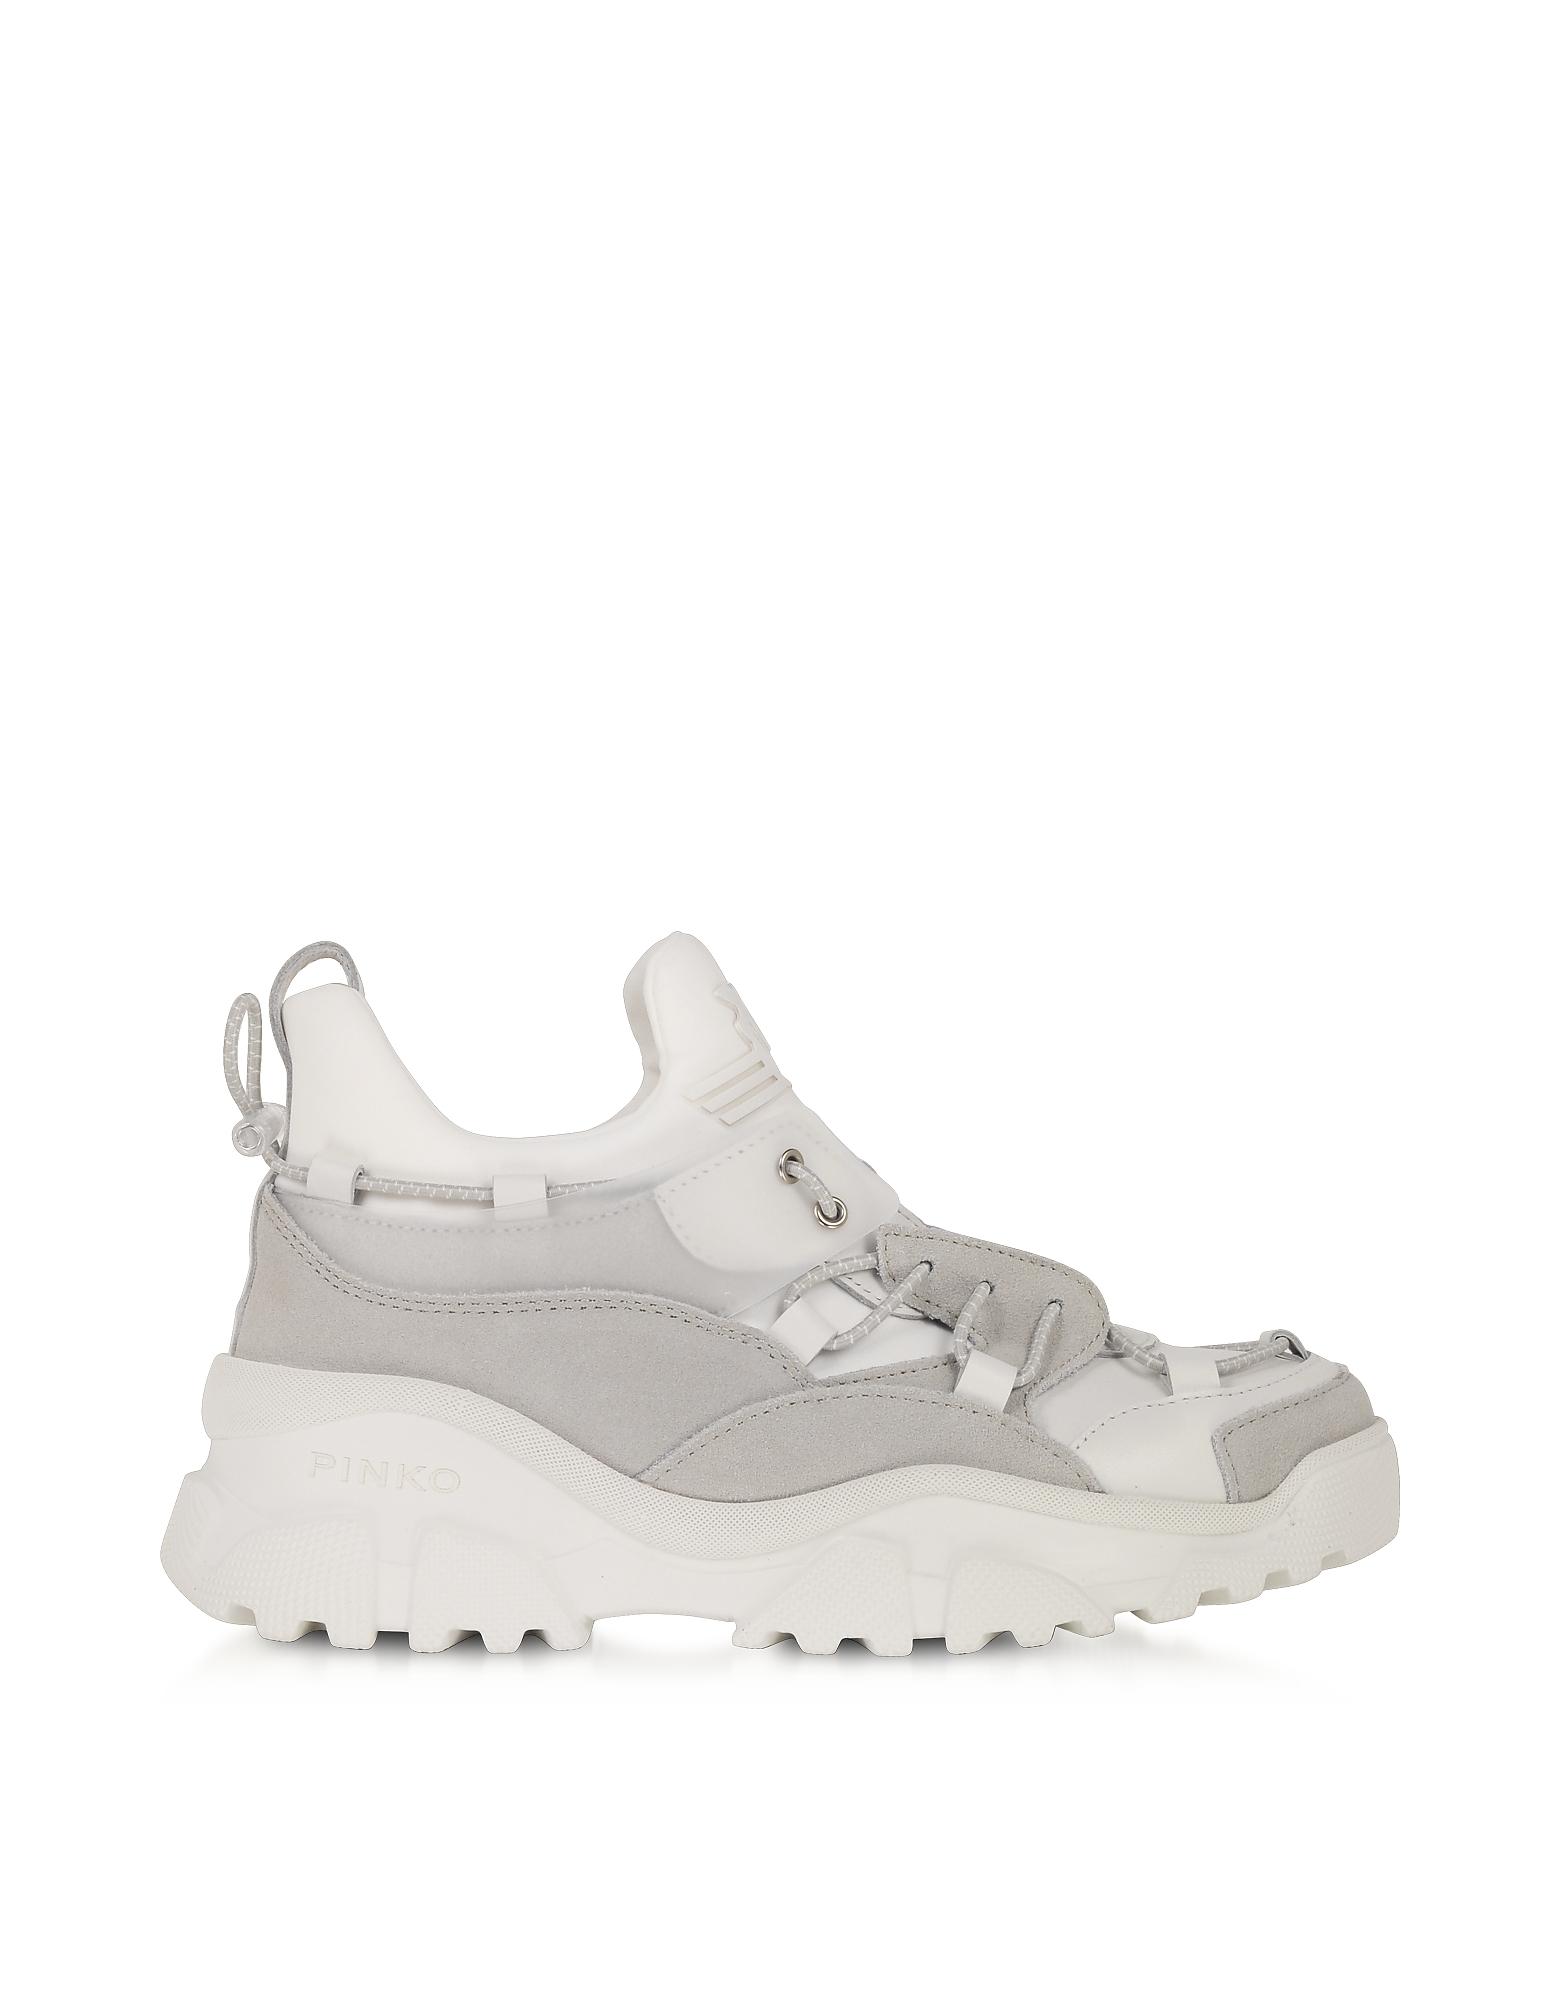 Pinko Designer Shoes, Cumino White Leather Women's Sneakers